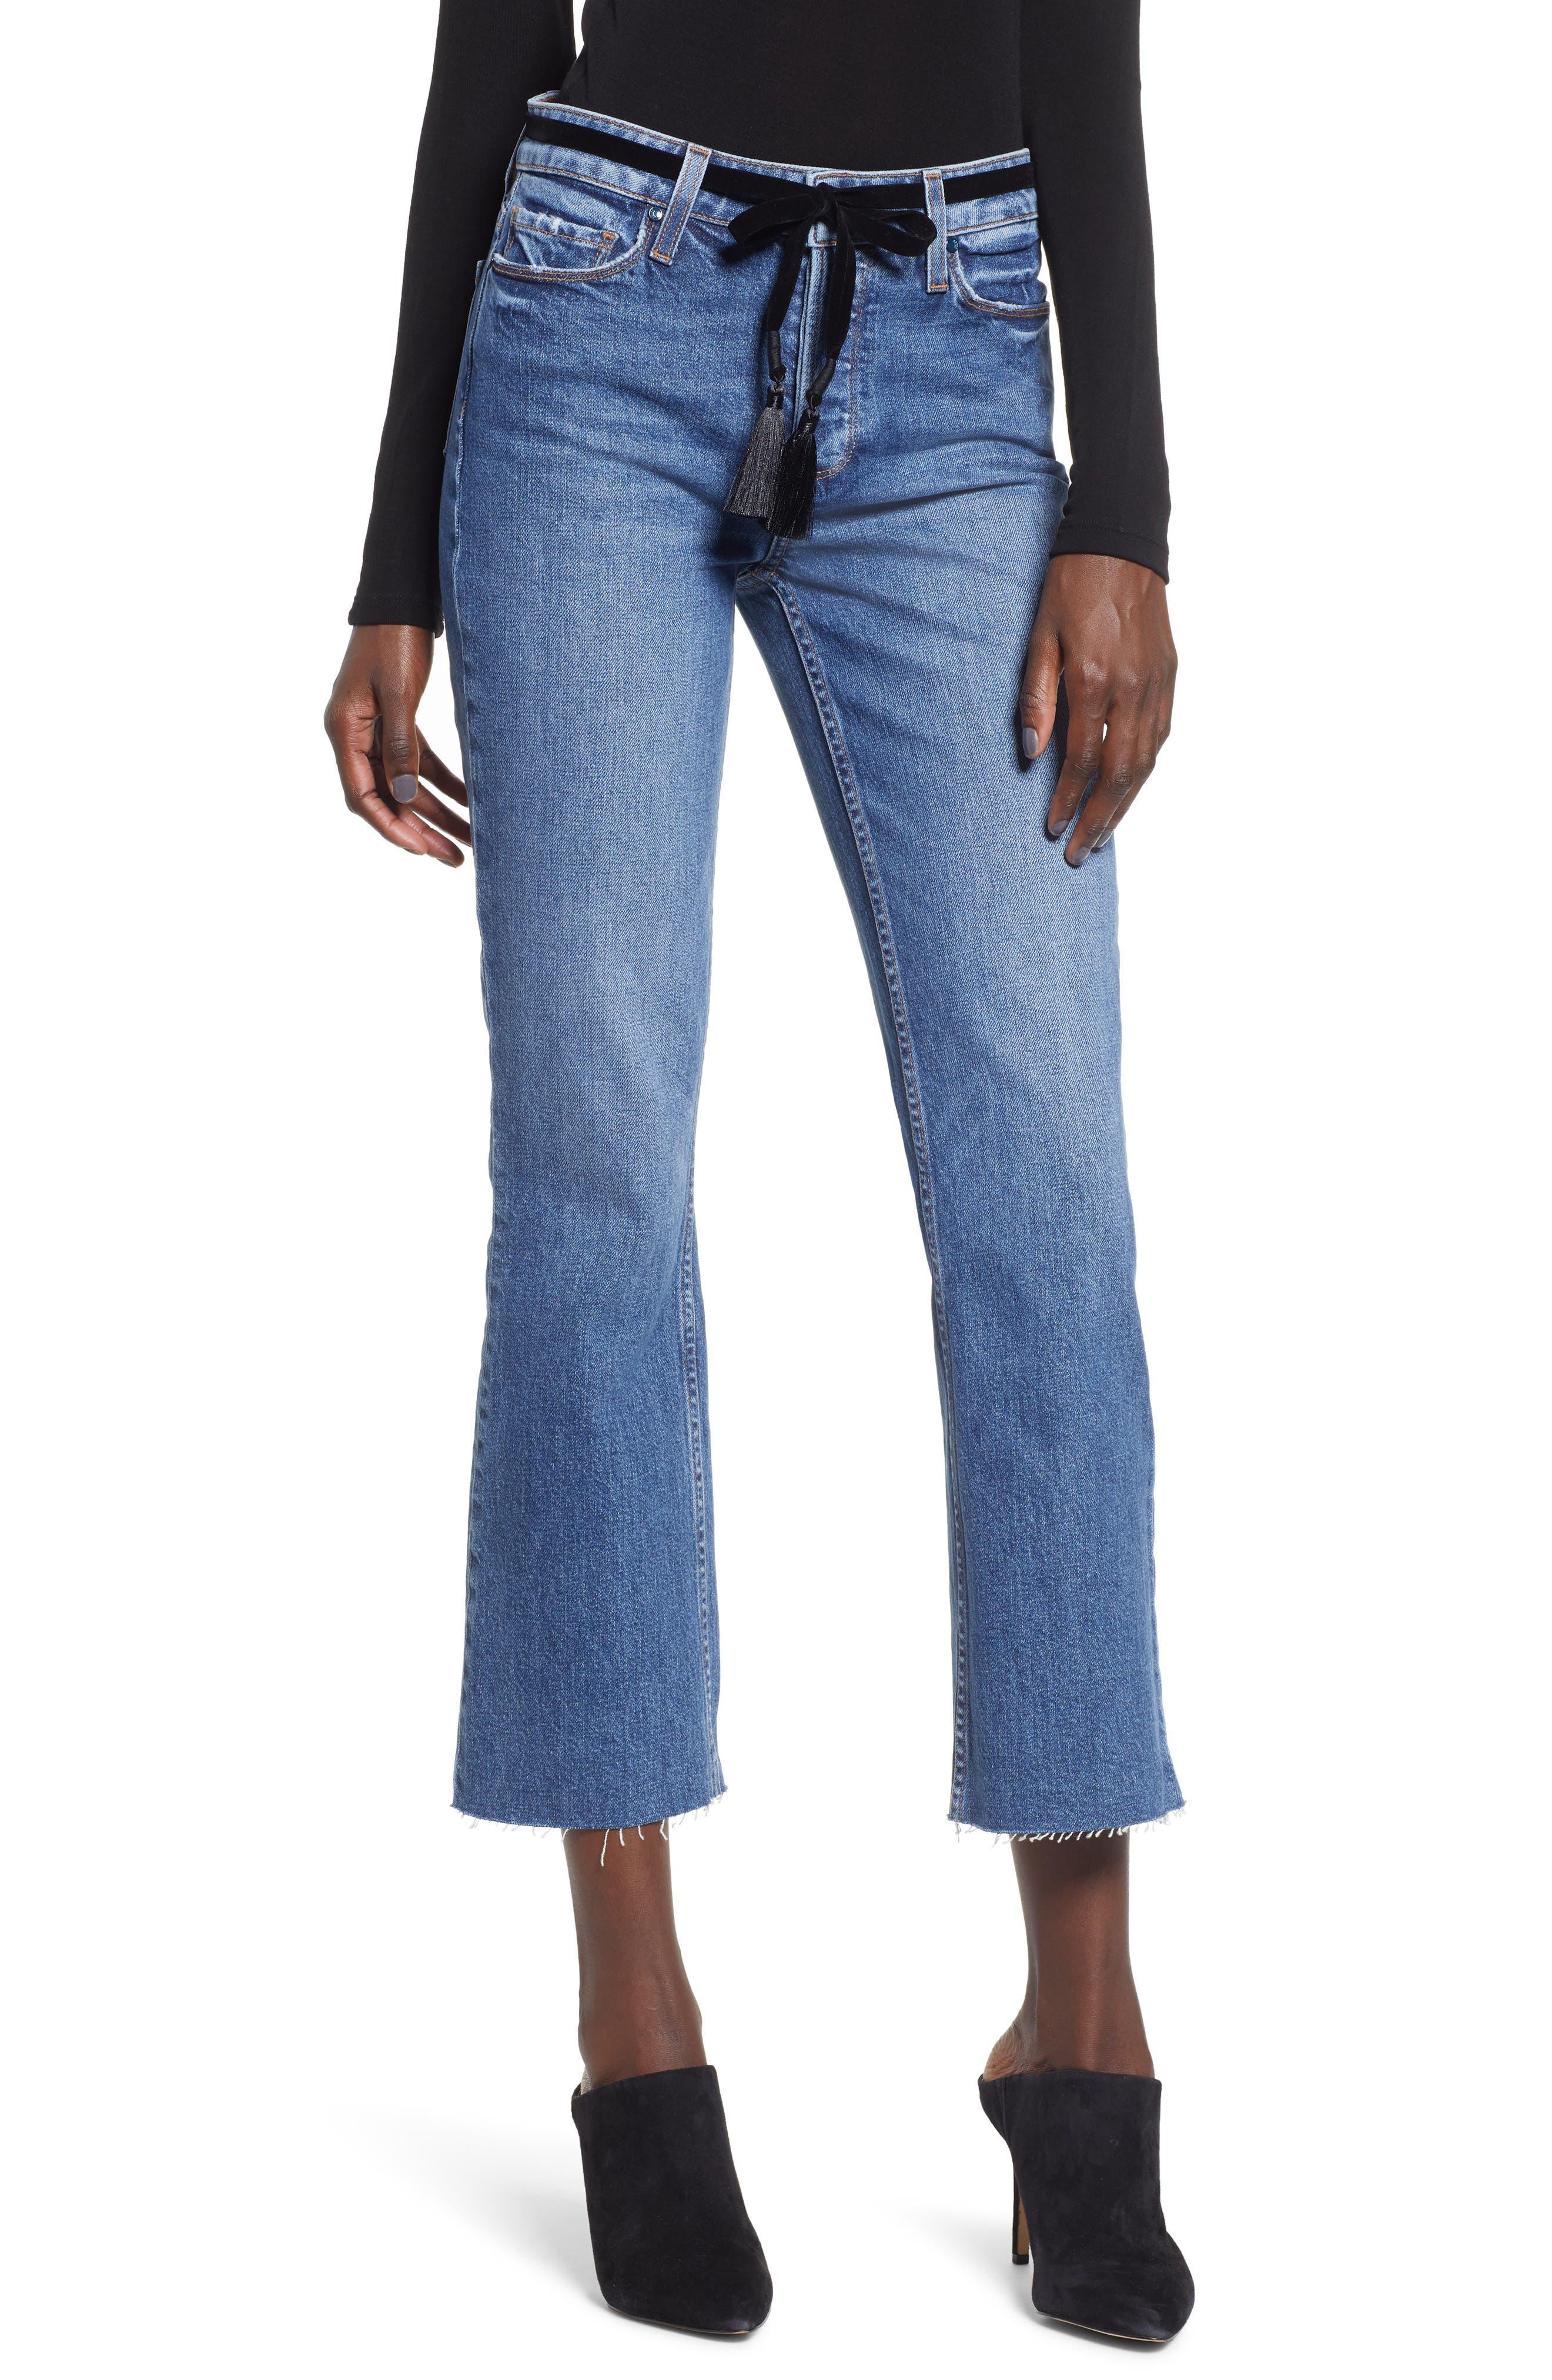 Vintage Colette Cropped Flare Jeans In Hutton Tassel